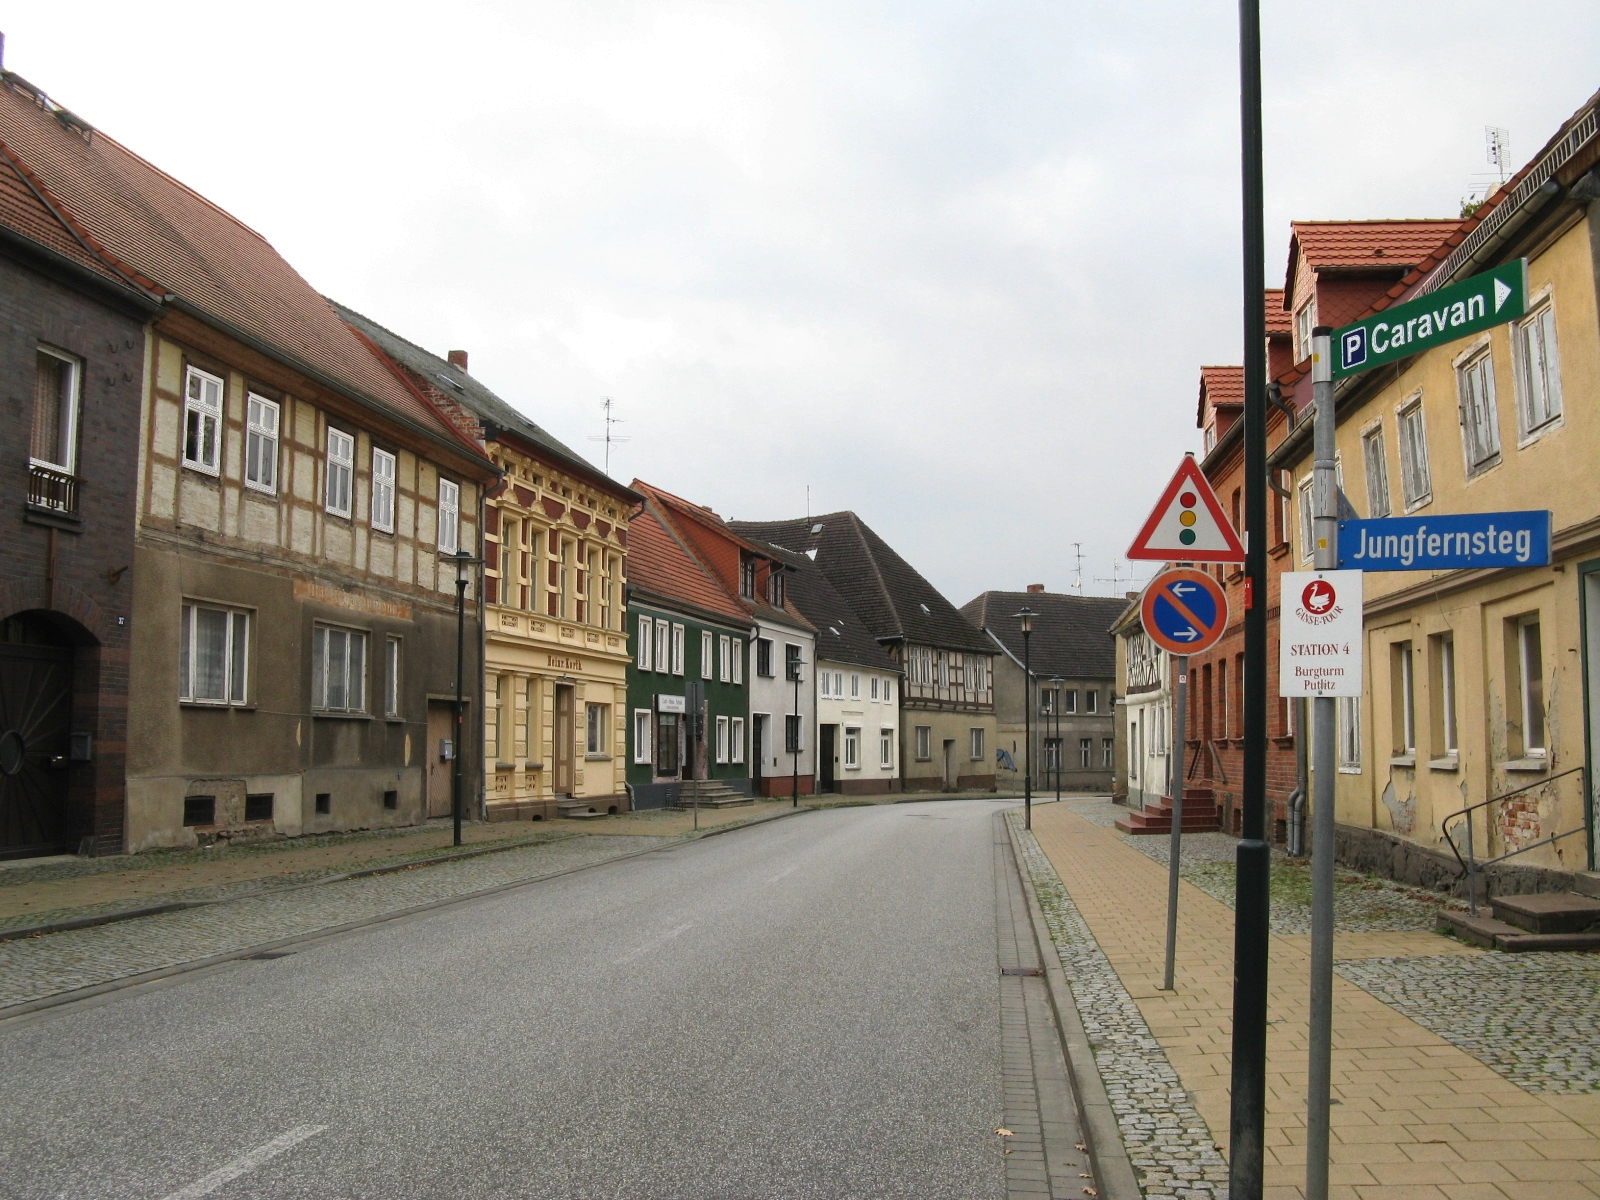 fteie gang bang Putlitz(Brandenburg)